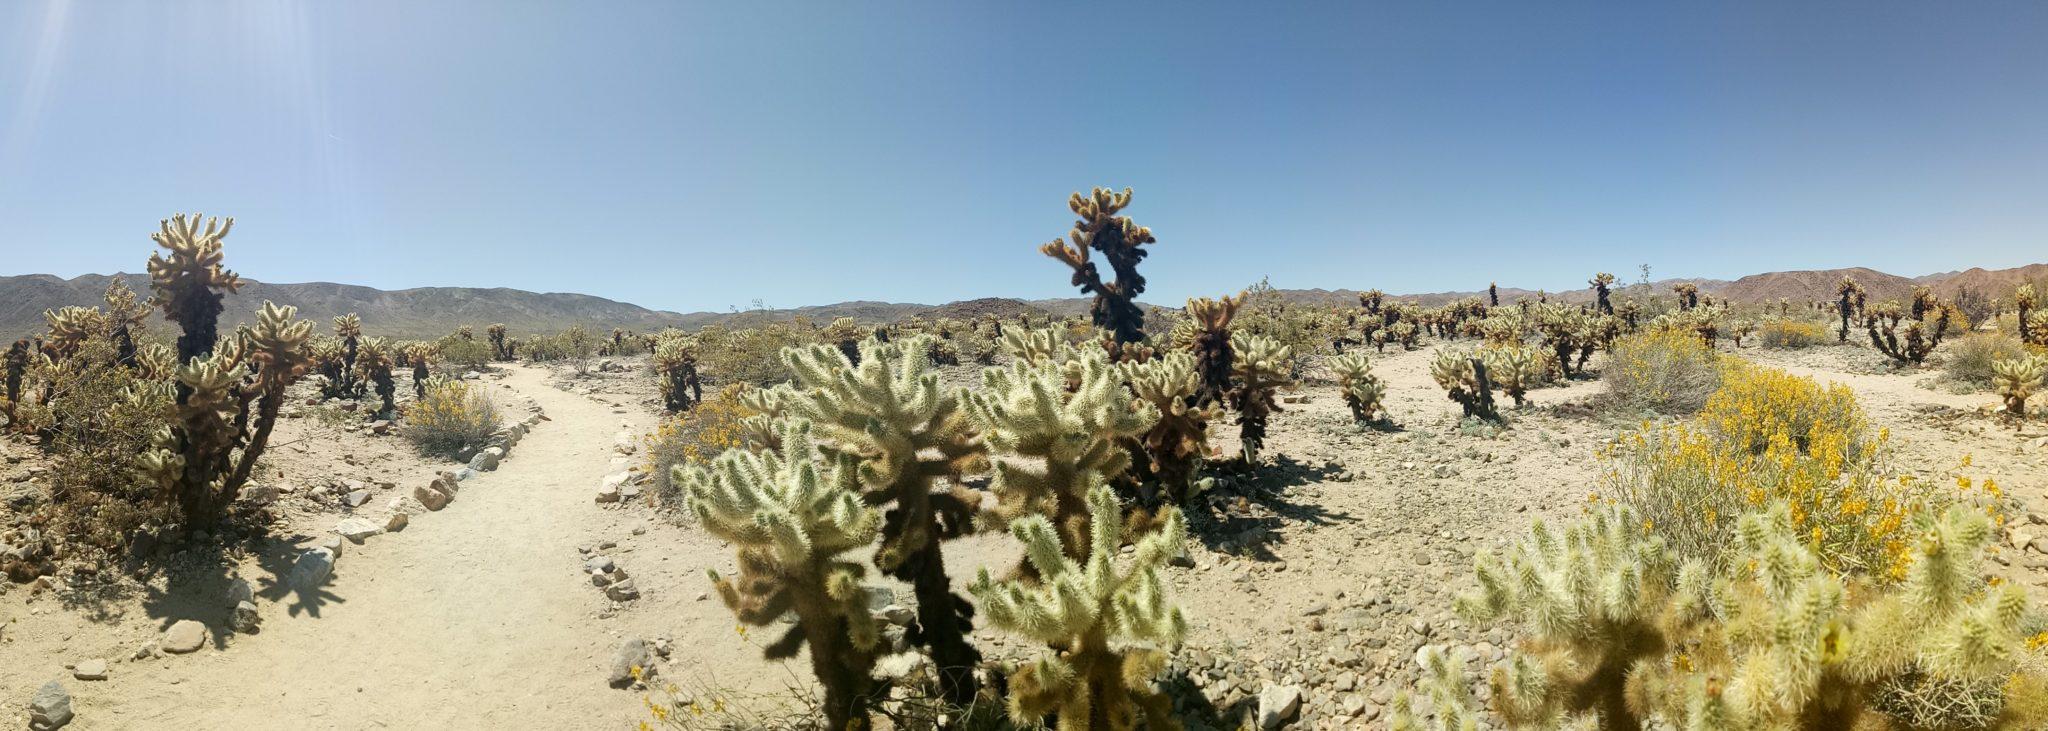 desert diaries joshua tree np